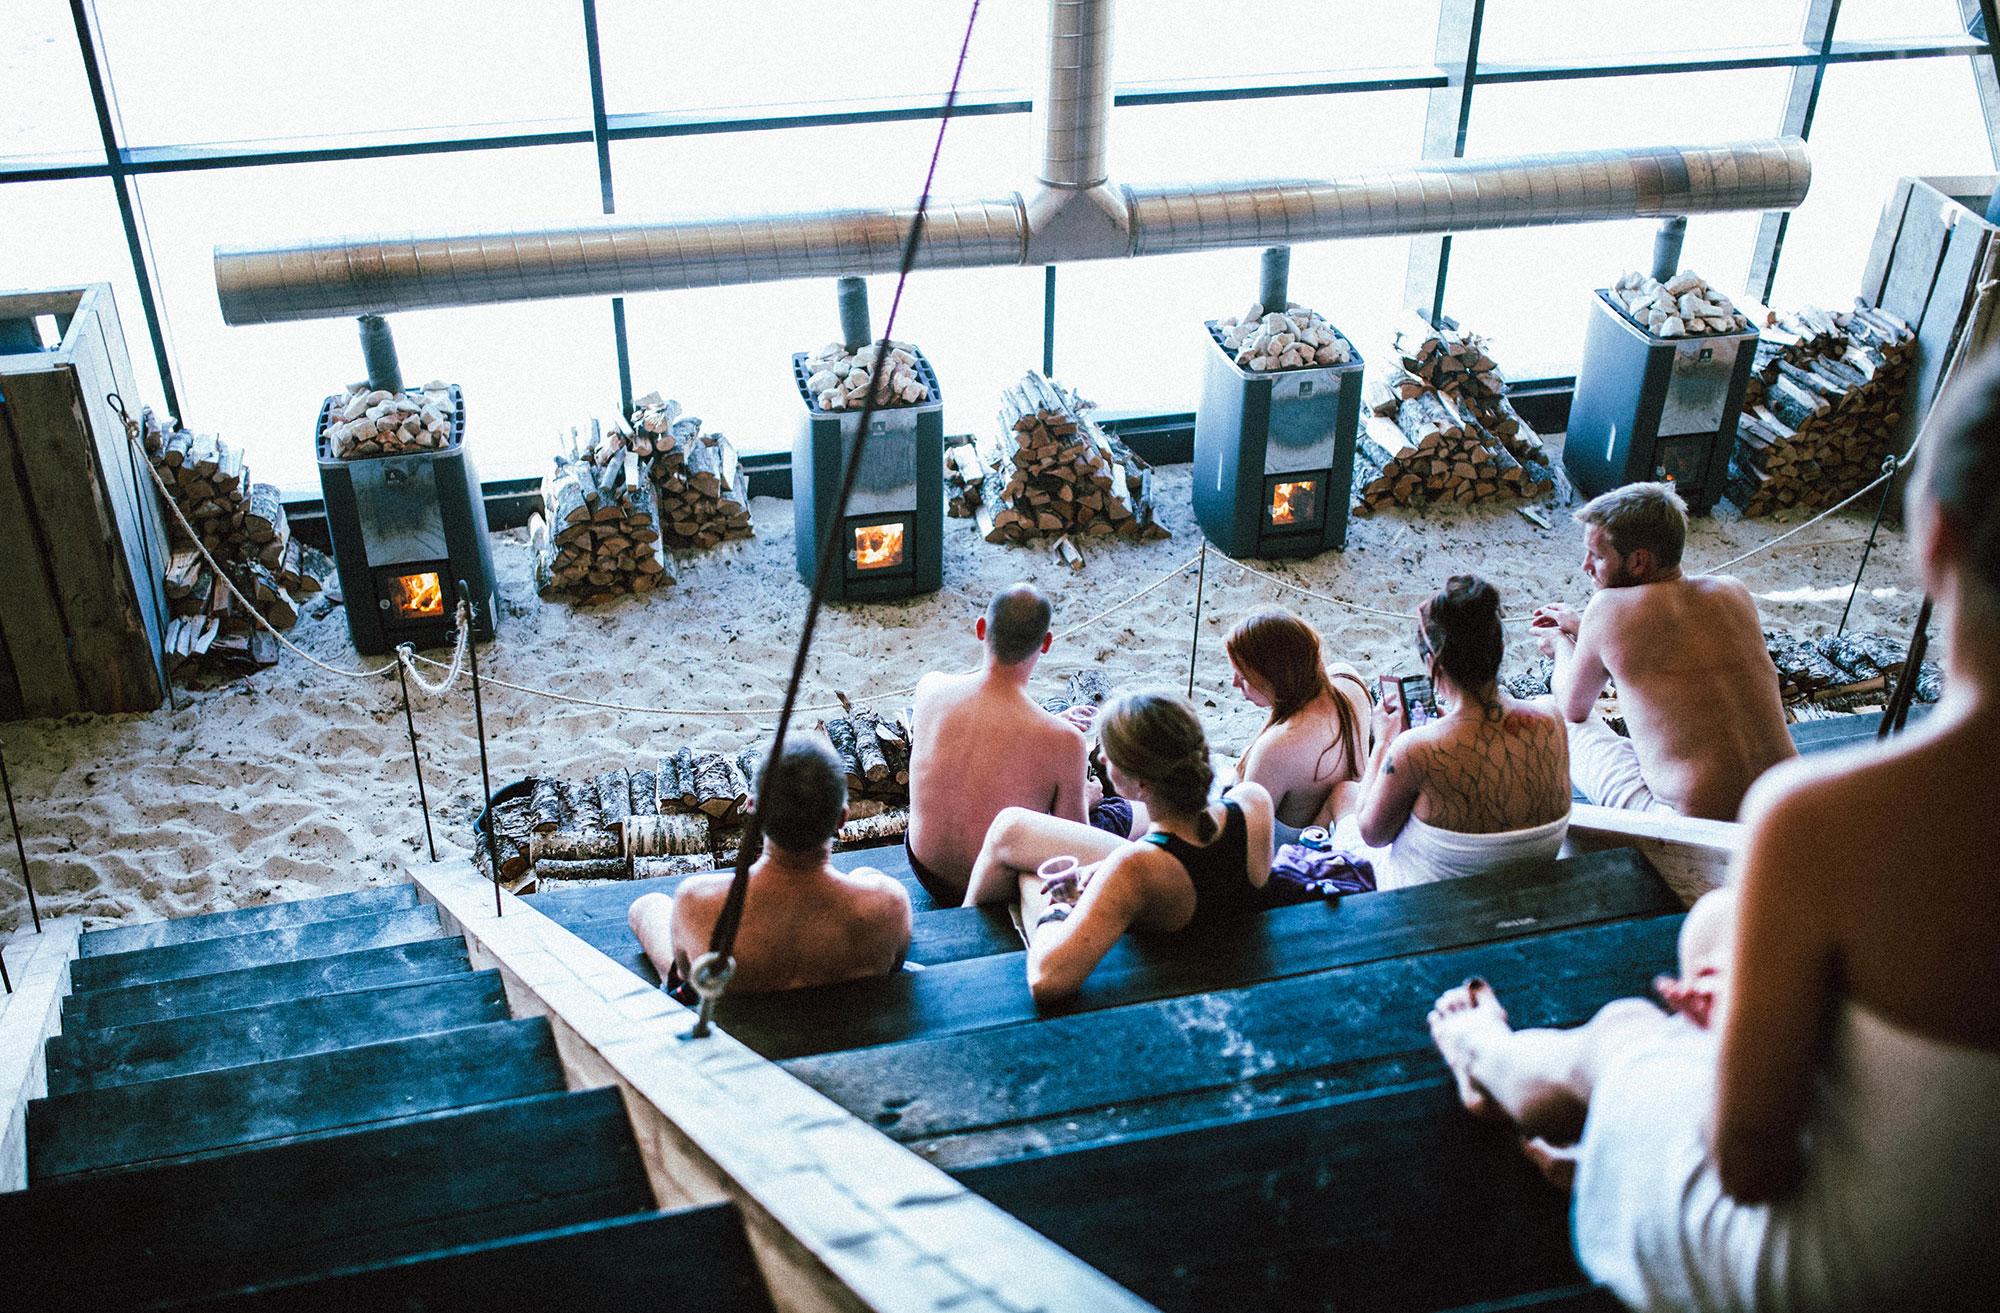 eskortepiker tromsø nudist i norge